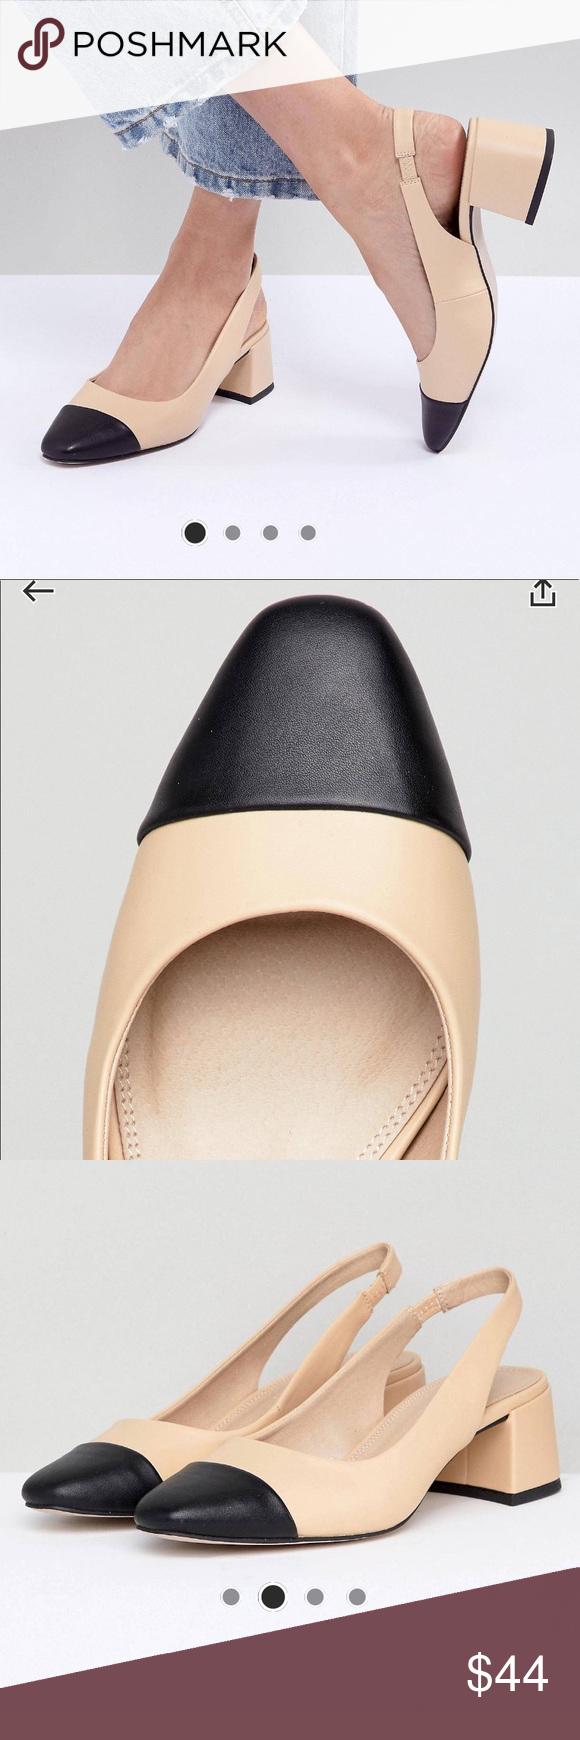 ASOS cap toe sling back heels NWT Heels, Chanel inspired